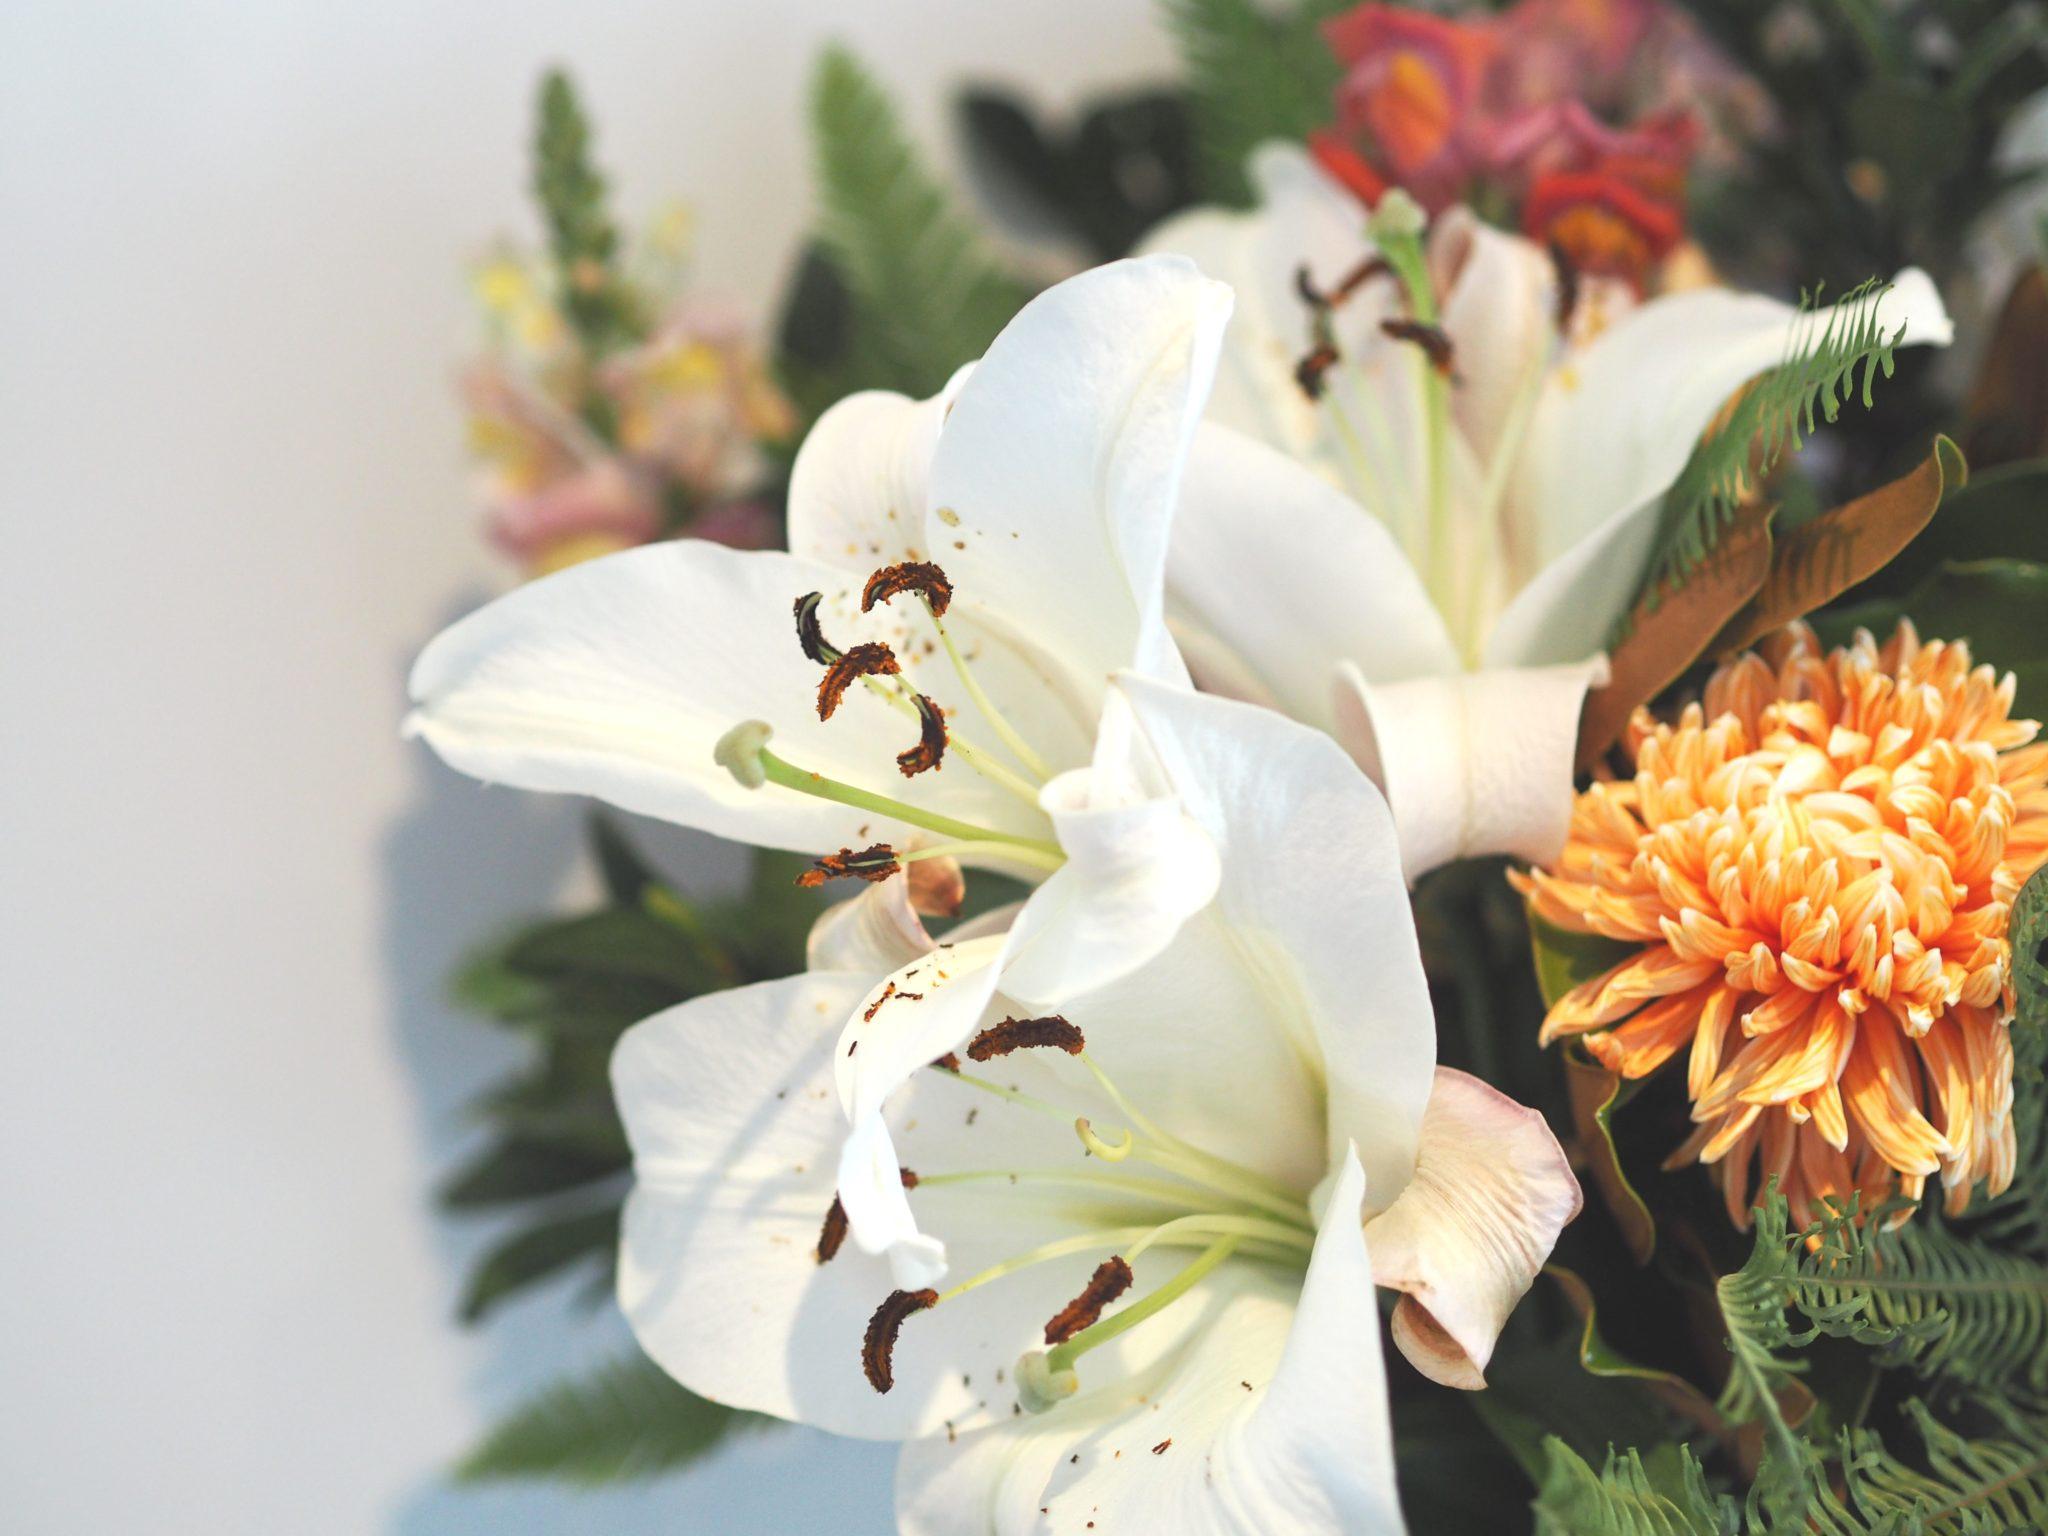 apartment decor hacks fresh flowers always 1